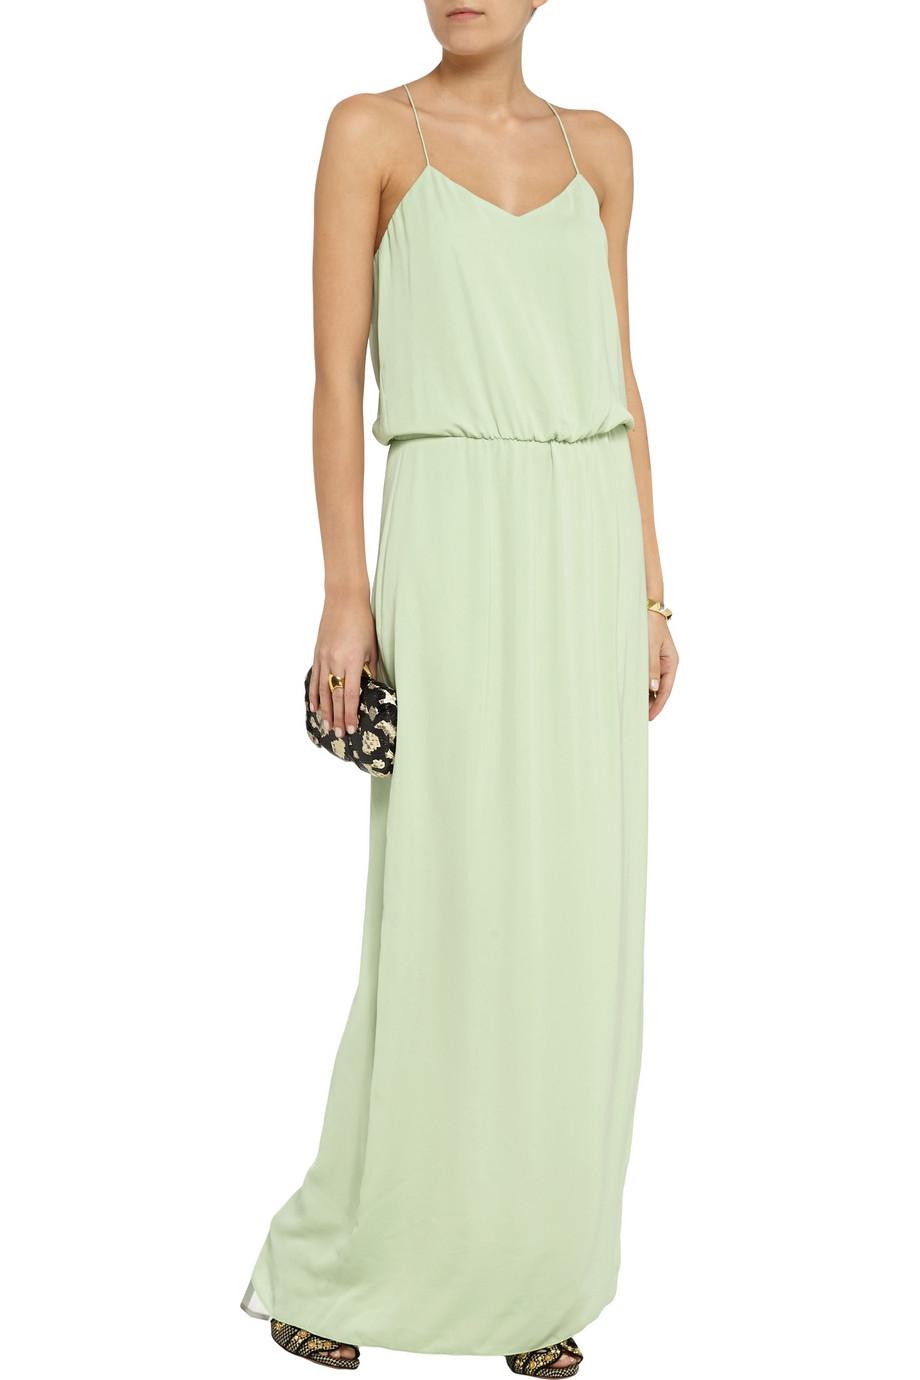 Tibi Draped Washed-georgette Maxi Dress in Green | Lyst